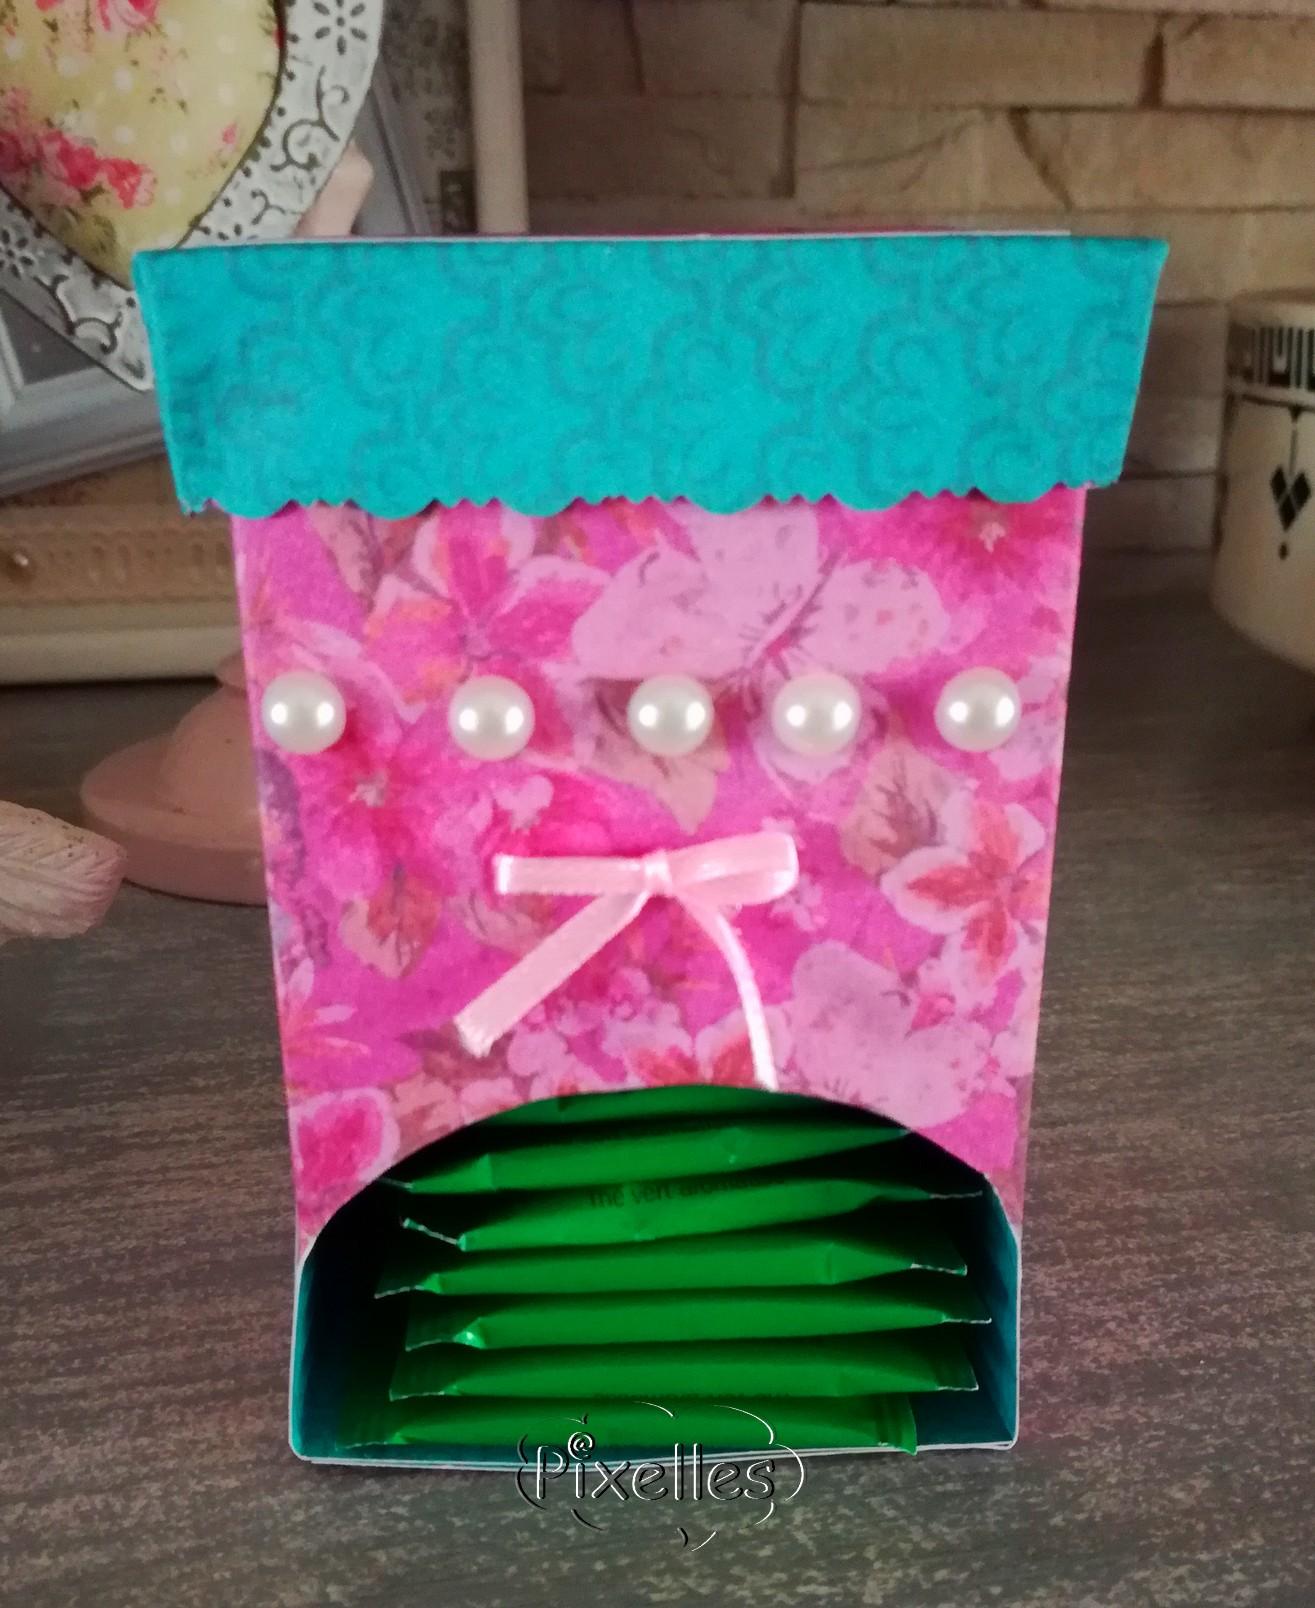 boite à the face vert et rose.jpg